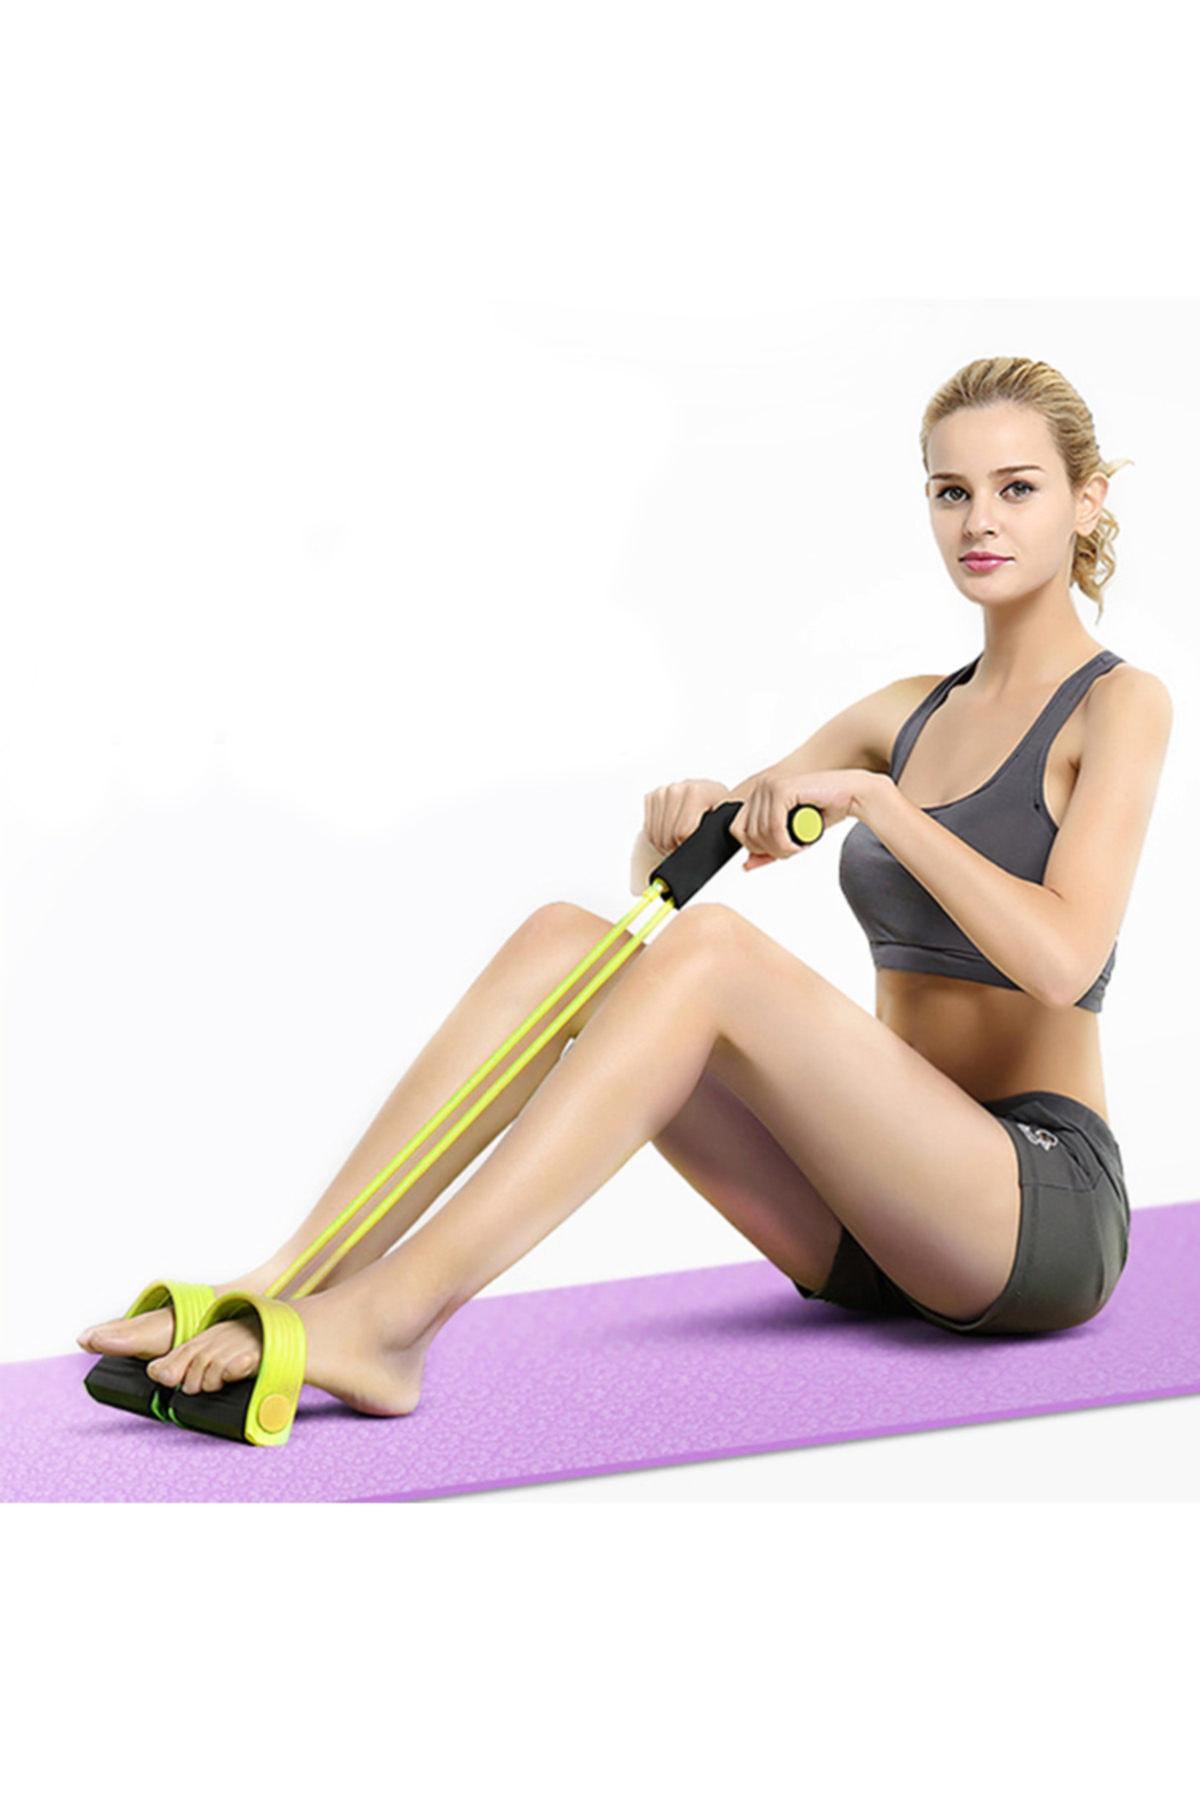 zabata Body Trimmer Wall Pulley Kondisyon Küreği Mekik Direnç Lastiği Spor Egzersiz Aleti 1